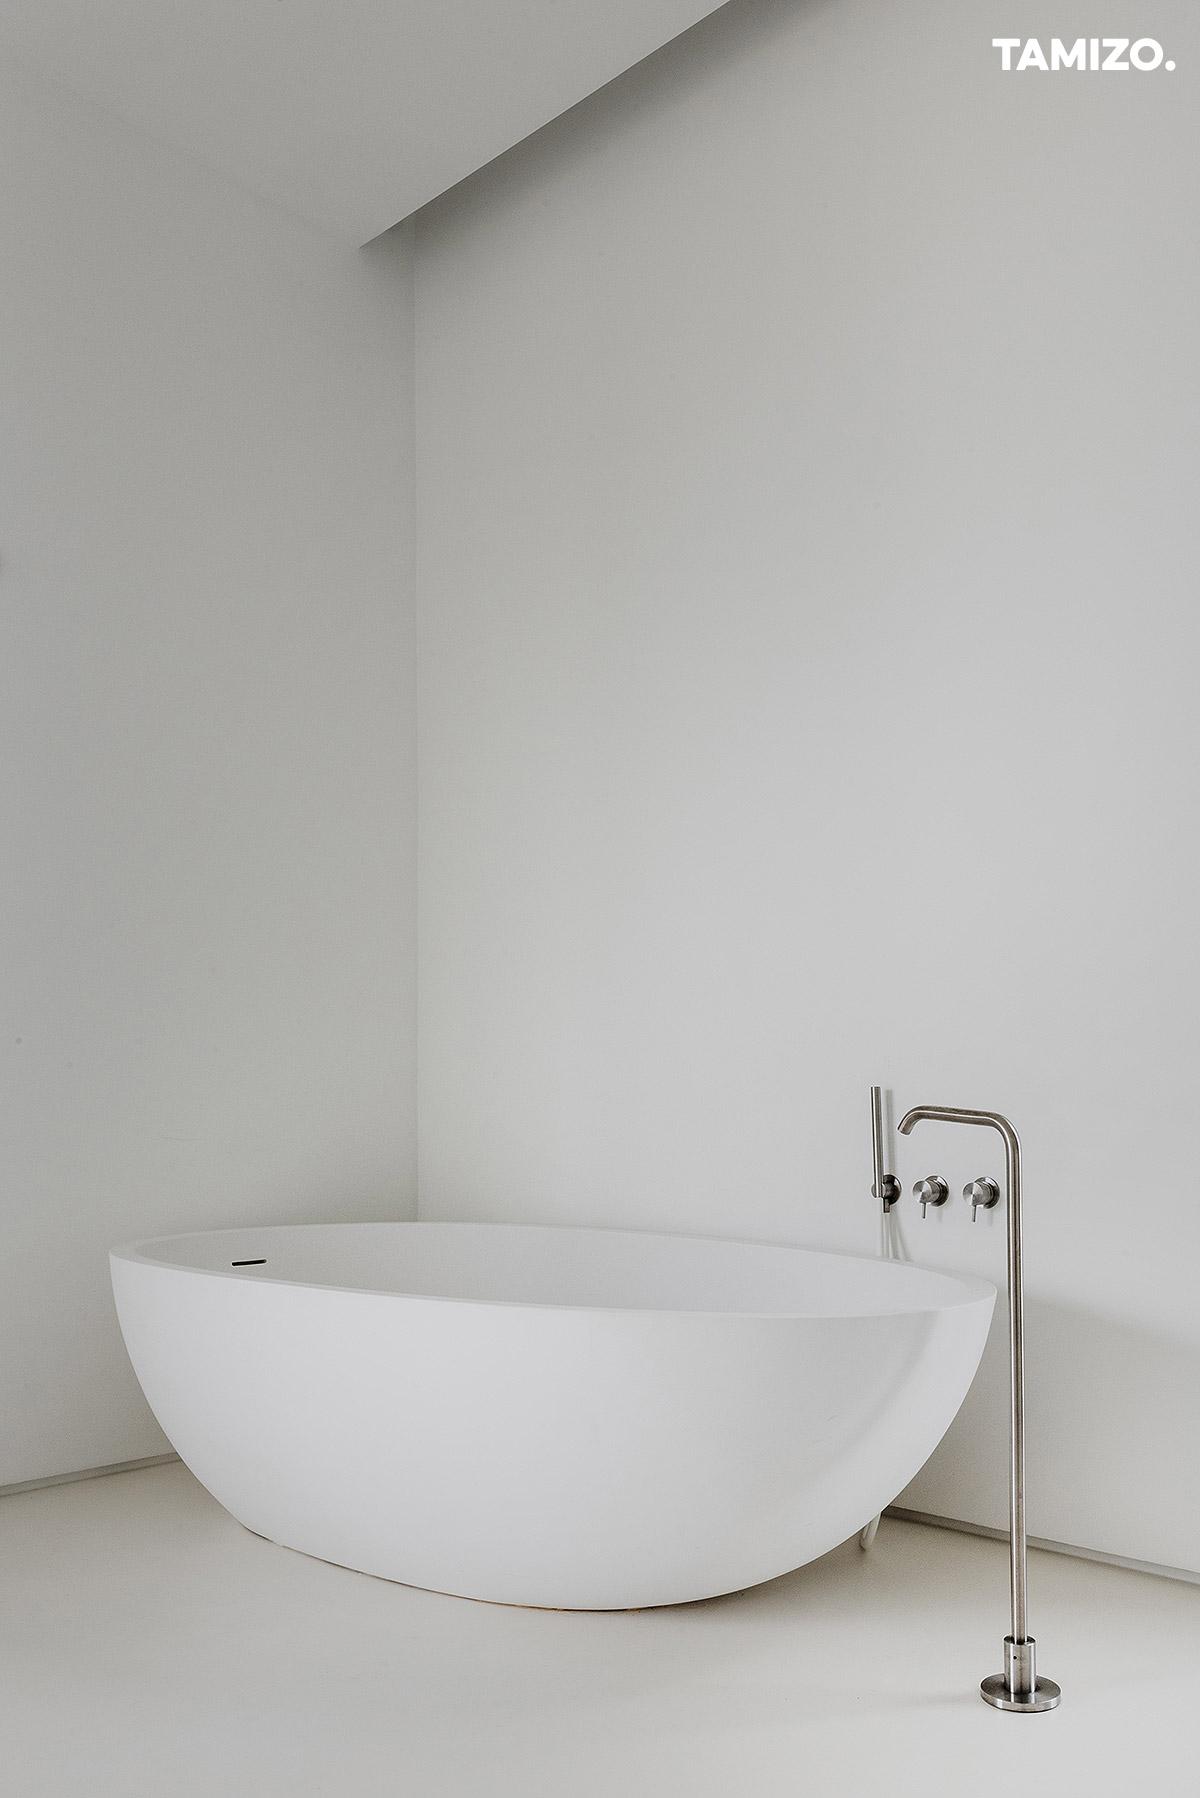 034_tamizo_architects_interior_house_realization_warsaw_poland_49